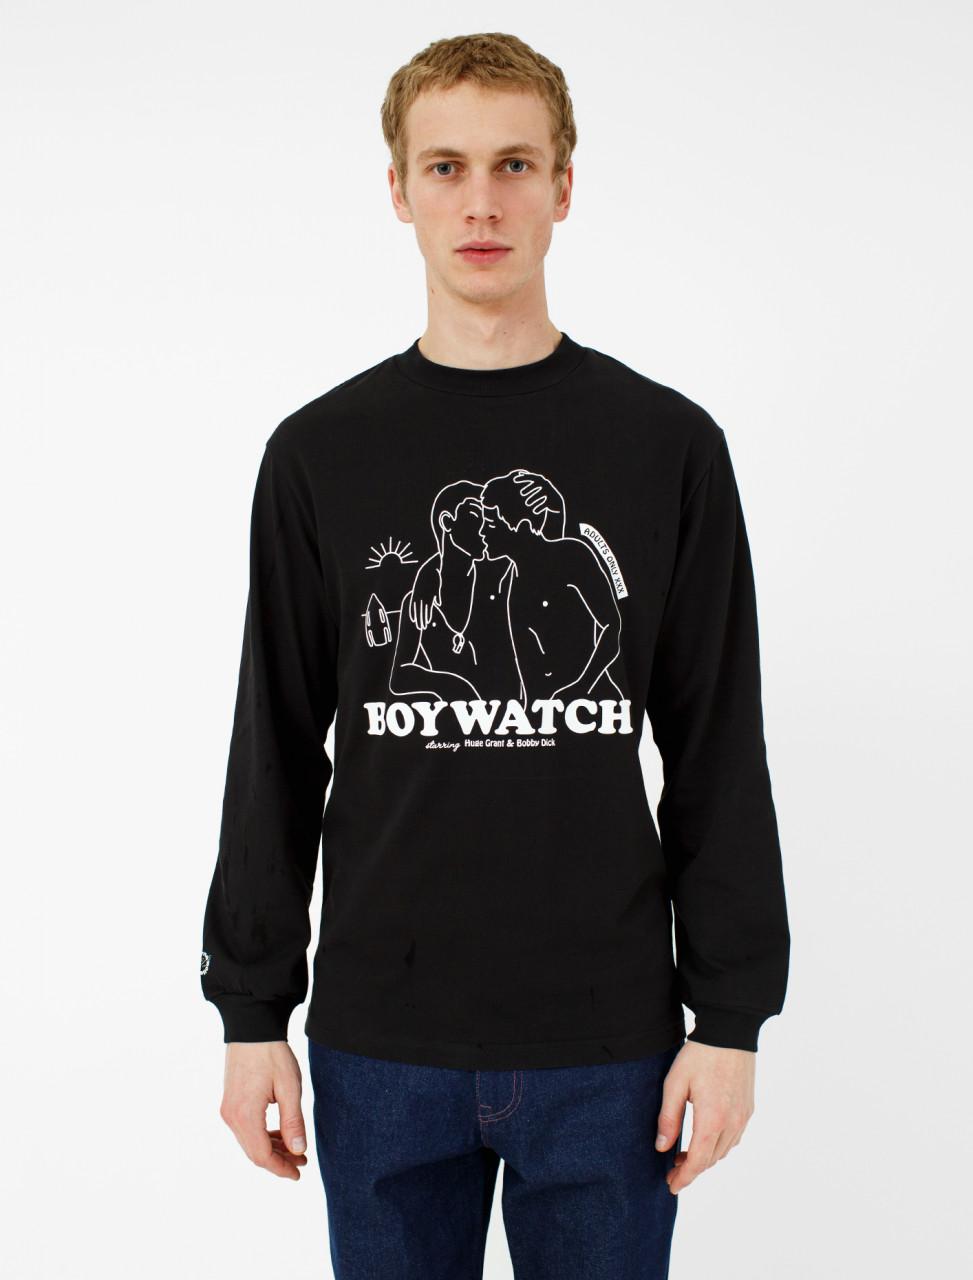 Boywatch Longsleeve T-Shirt